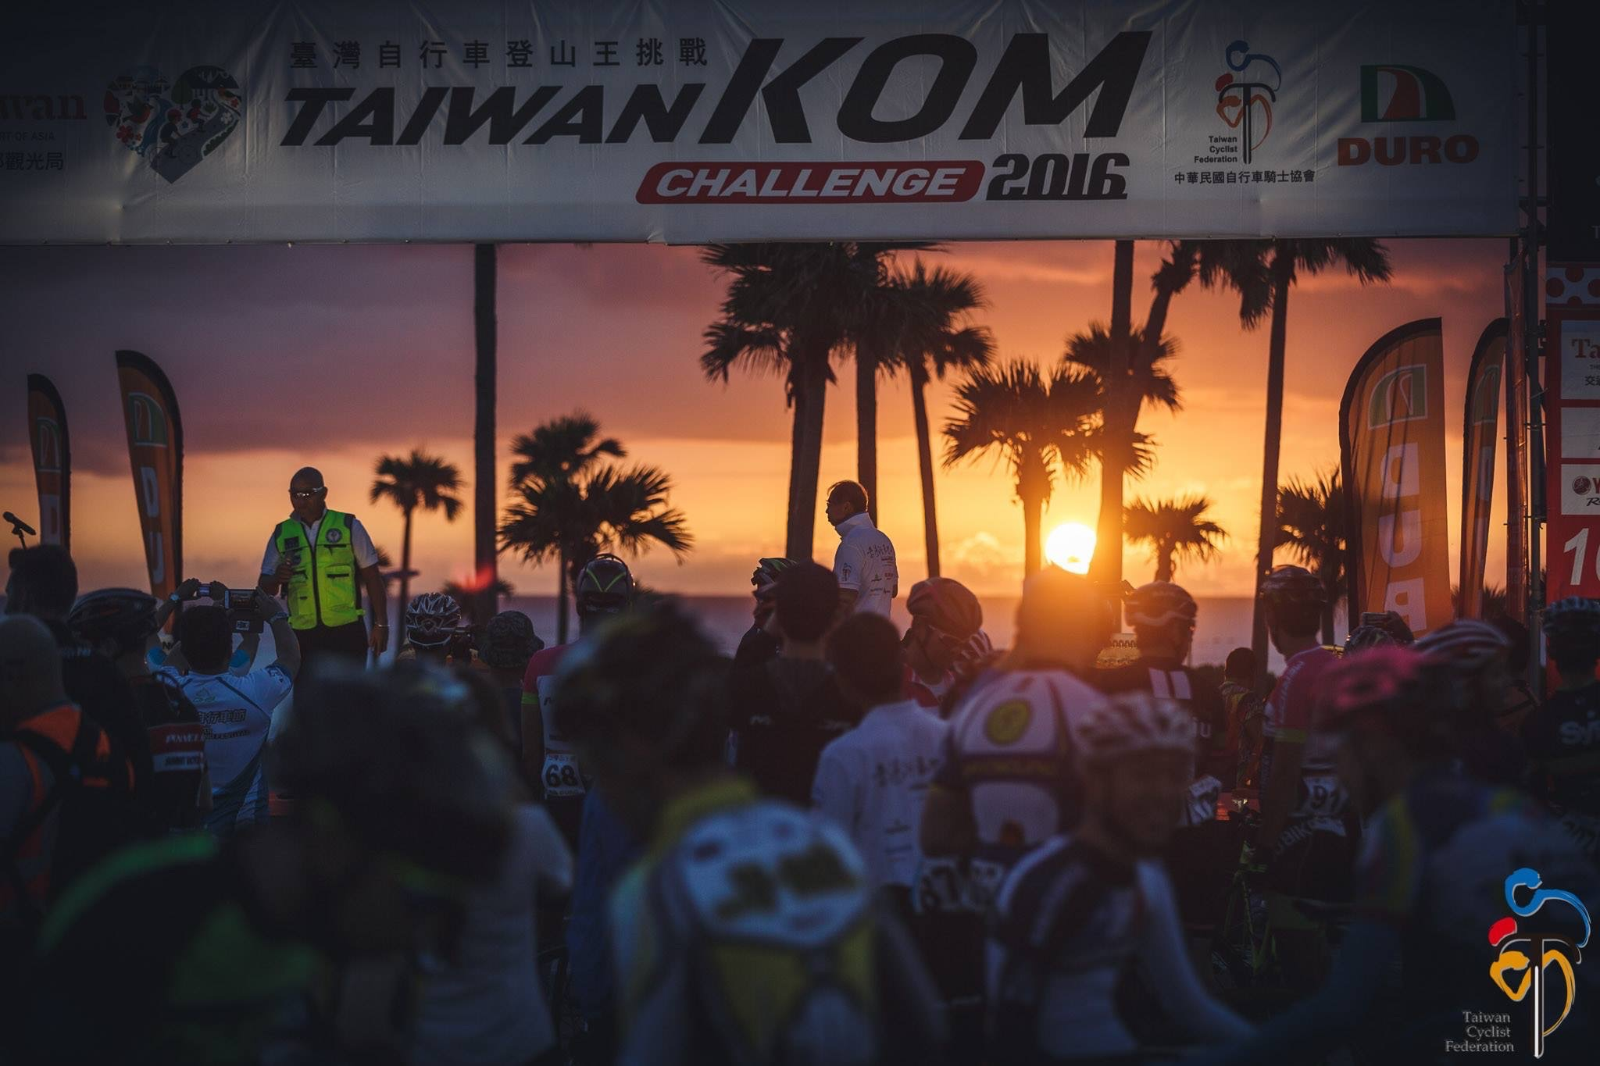 Insider: Taiwan KOM Challenge, Race Day